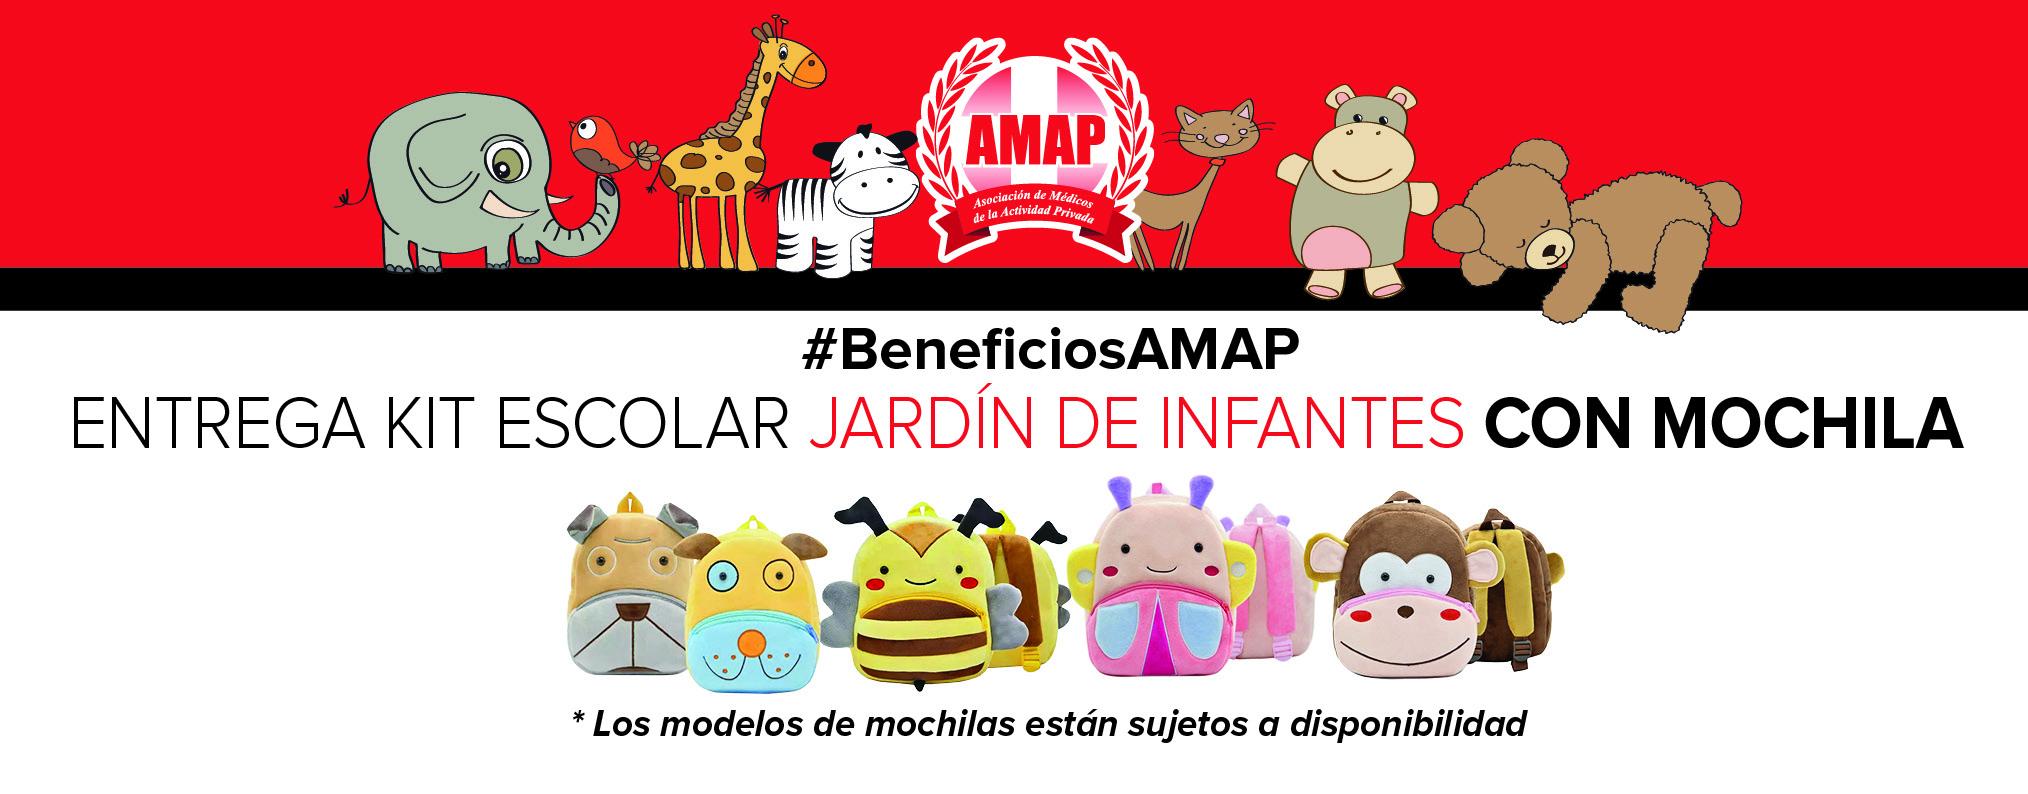 Amap Bolsas De útiles Escolares Para Hijos De Afiliados A La Amap